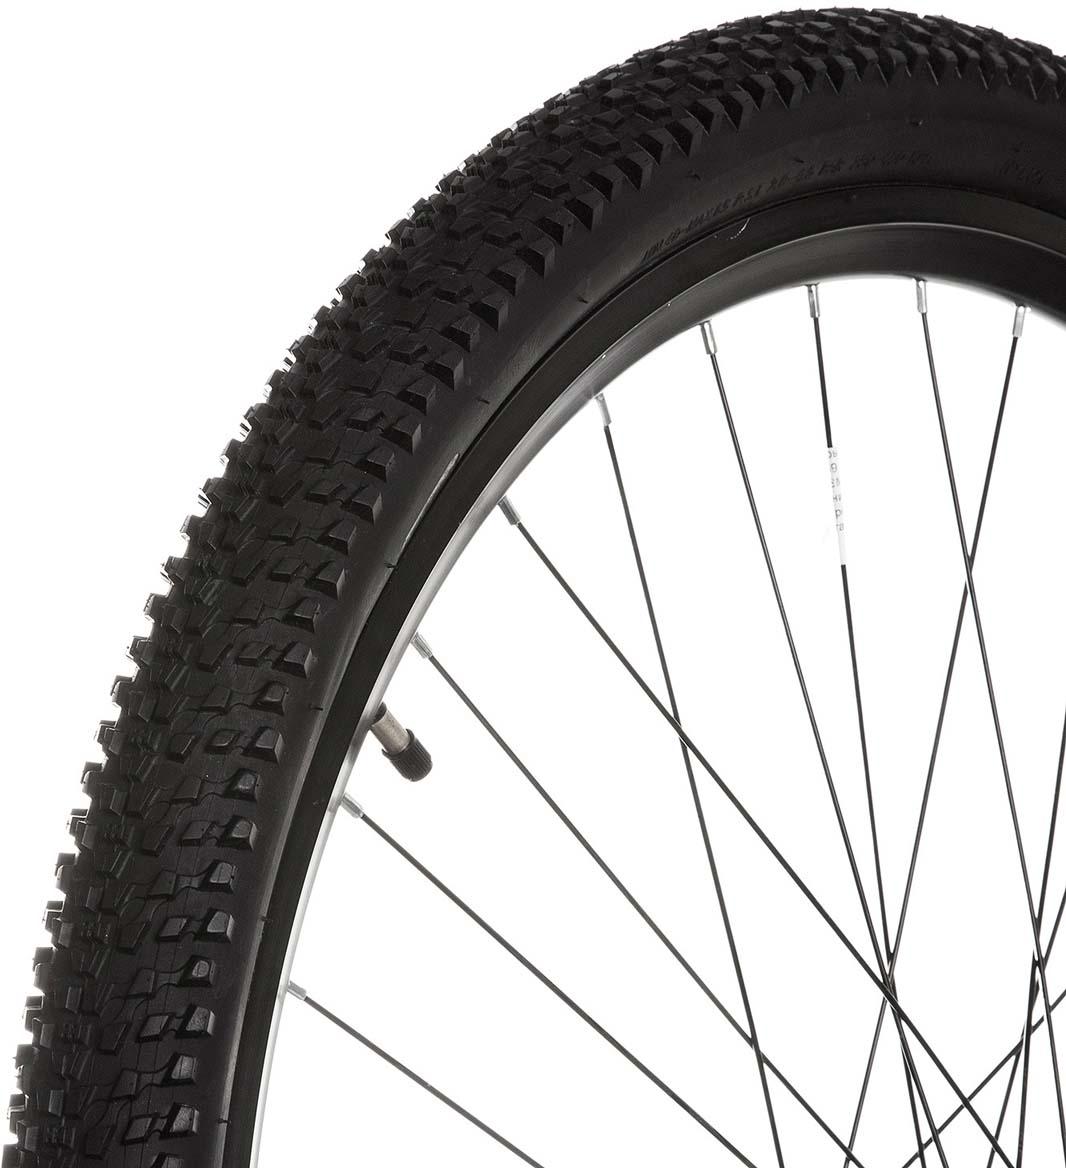 Покрышка низкая Kenda Small Block-2 30TPI 29х2.35 5-529069 (55х622) K1153 kenda high quality mtb folding bicycle tire mountain bike tyre tires 26 27 5 29x1 95 2 1 2 35 bike parts accessories